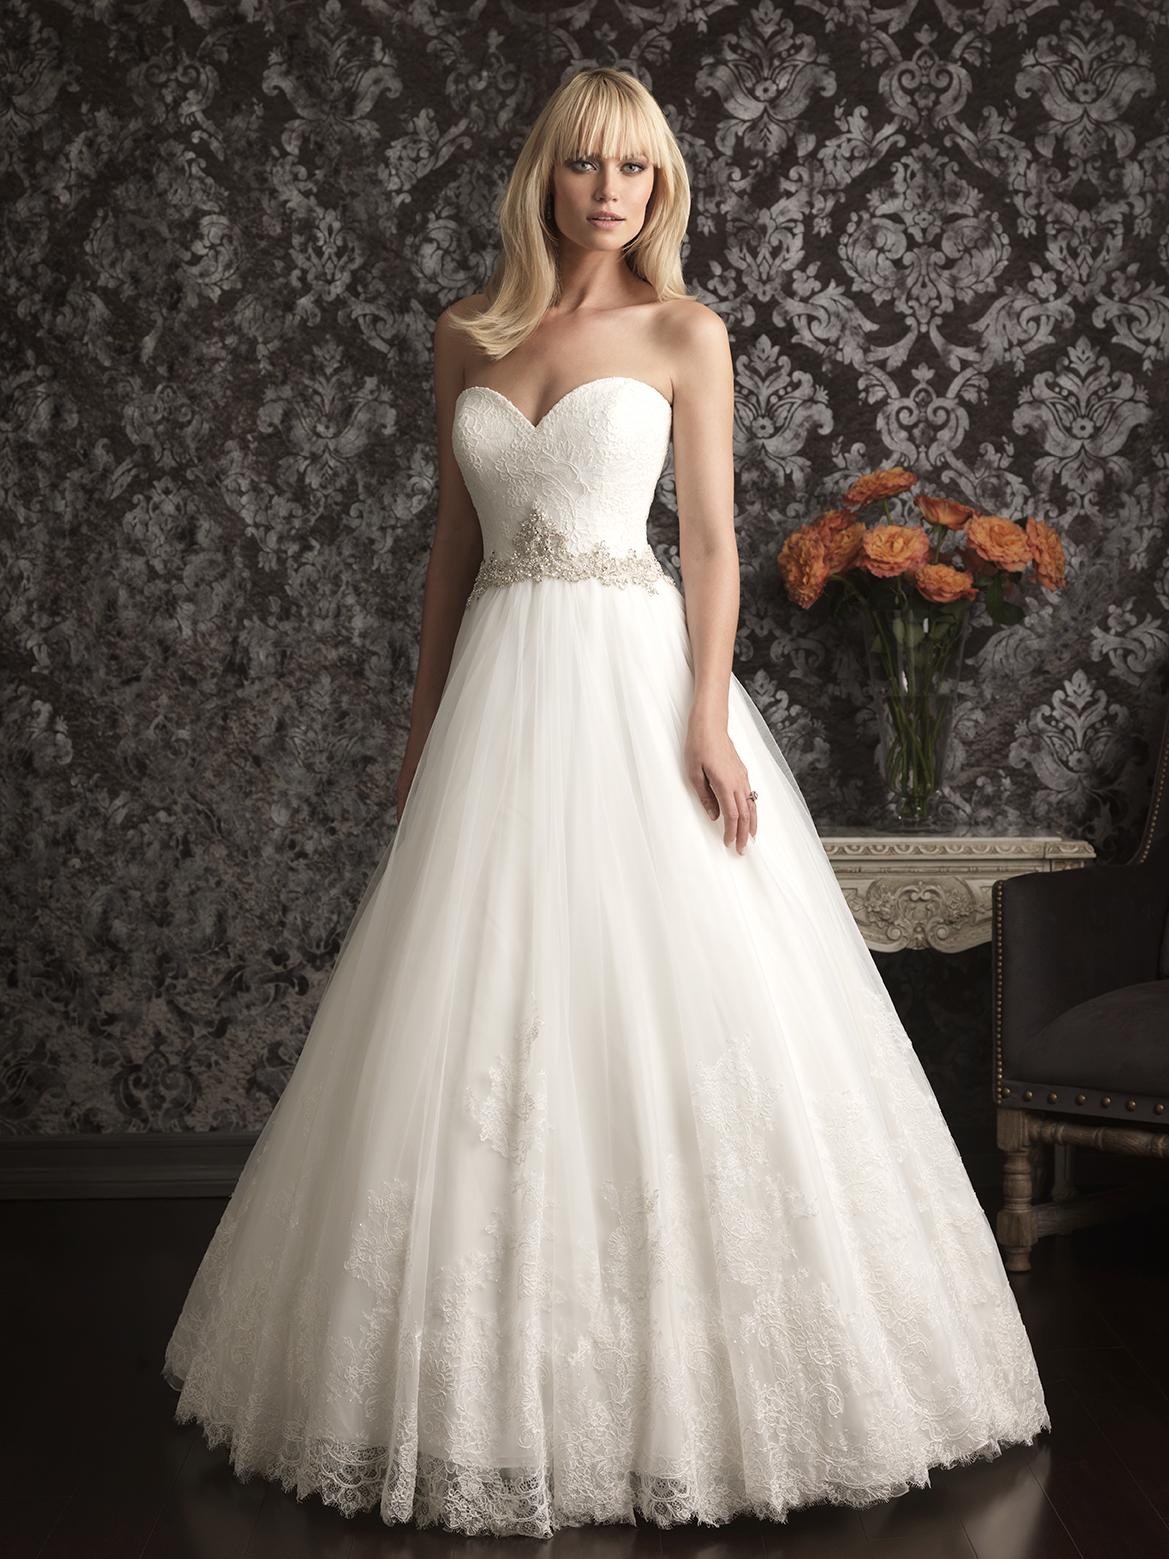 Allure Wedding Gowns 005 - Allure Wedding Gowns